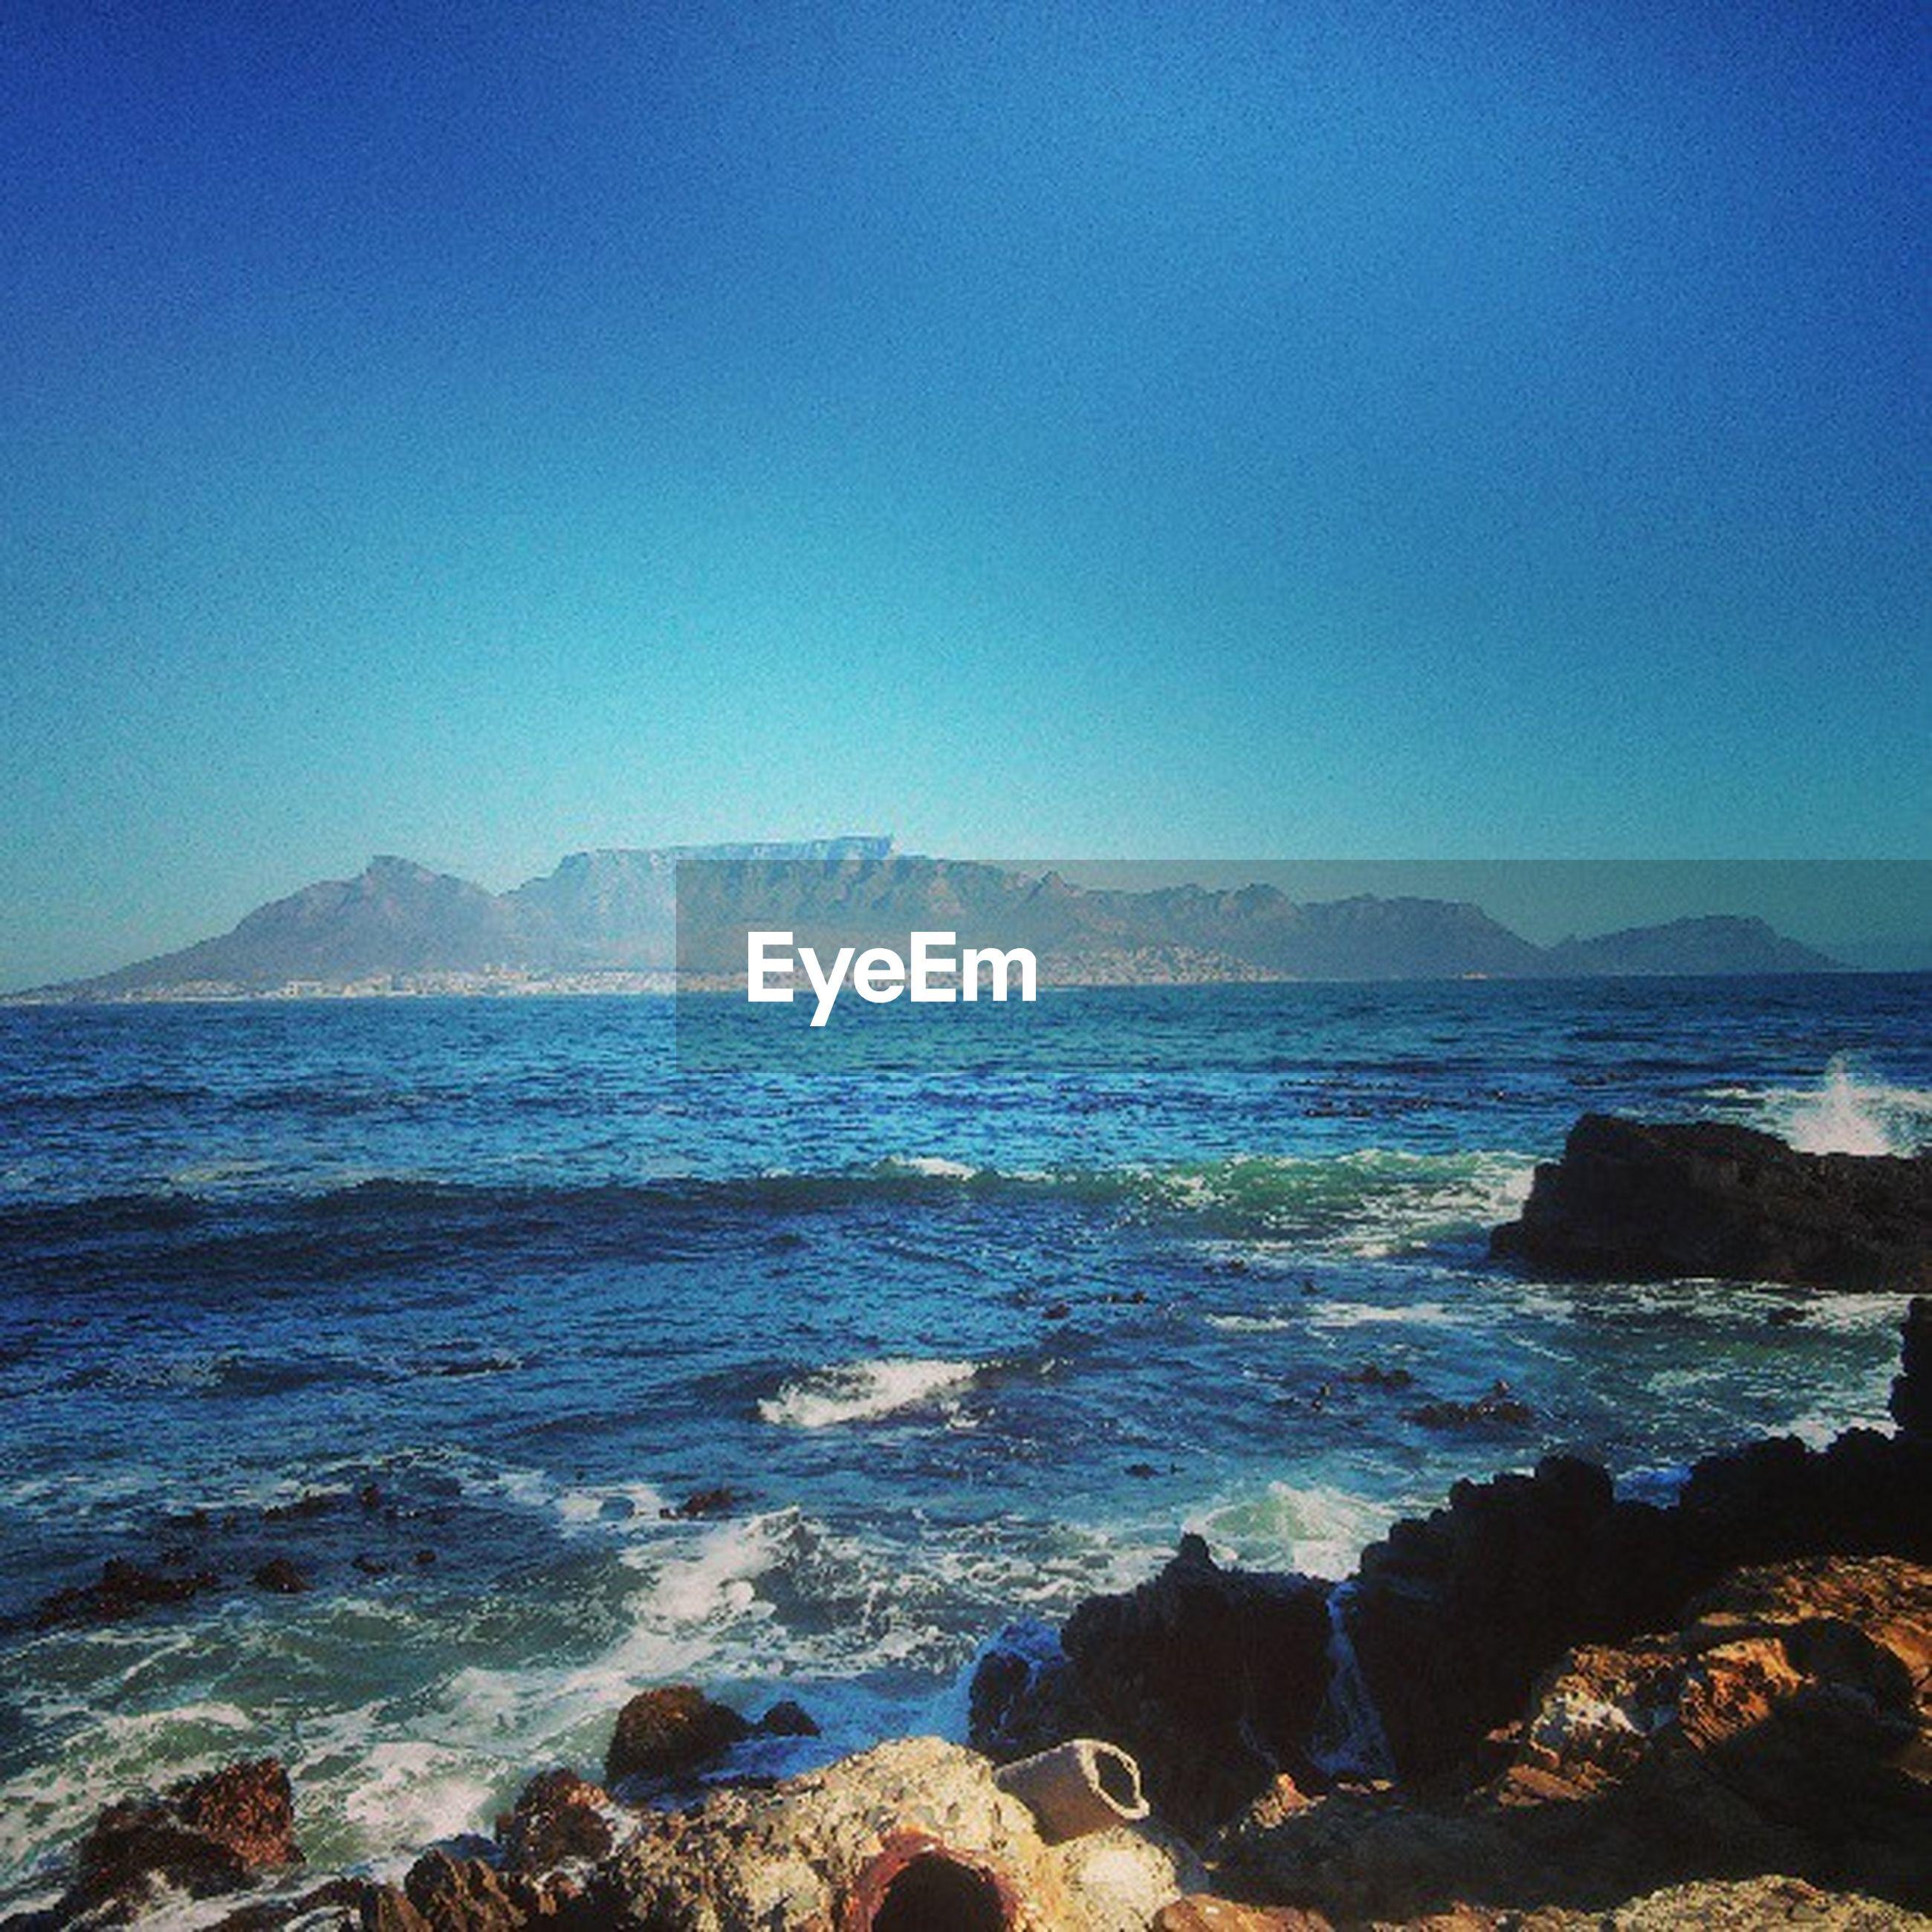 water, clear sky, sea, scenics, blue, tranquil scene, beauty in nature, copy space, mountain, tranquility, nature, rock - object, idyllic, rock formation, coastline, wave, shore, beach, mountain range, non-urban scene